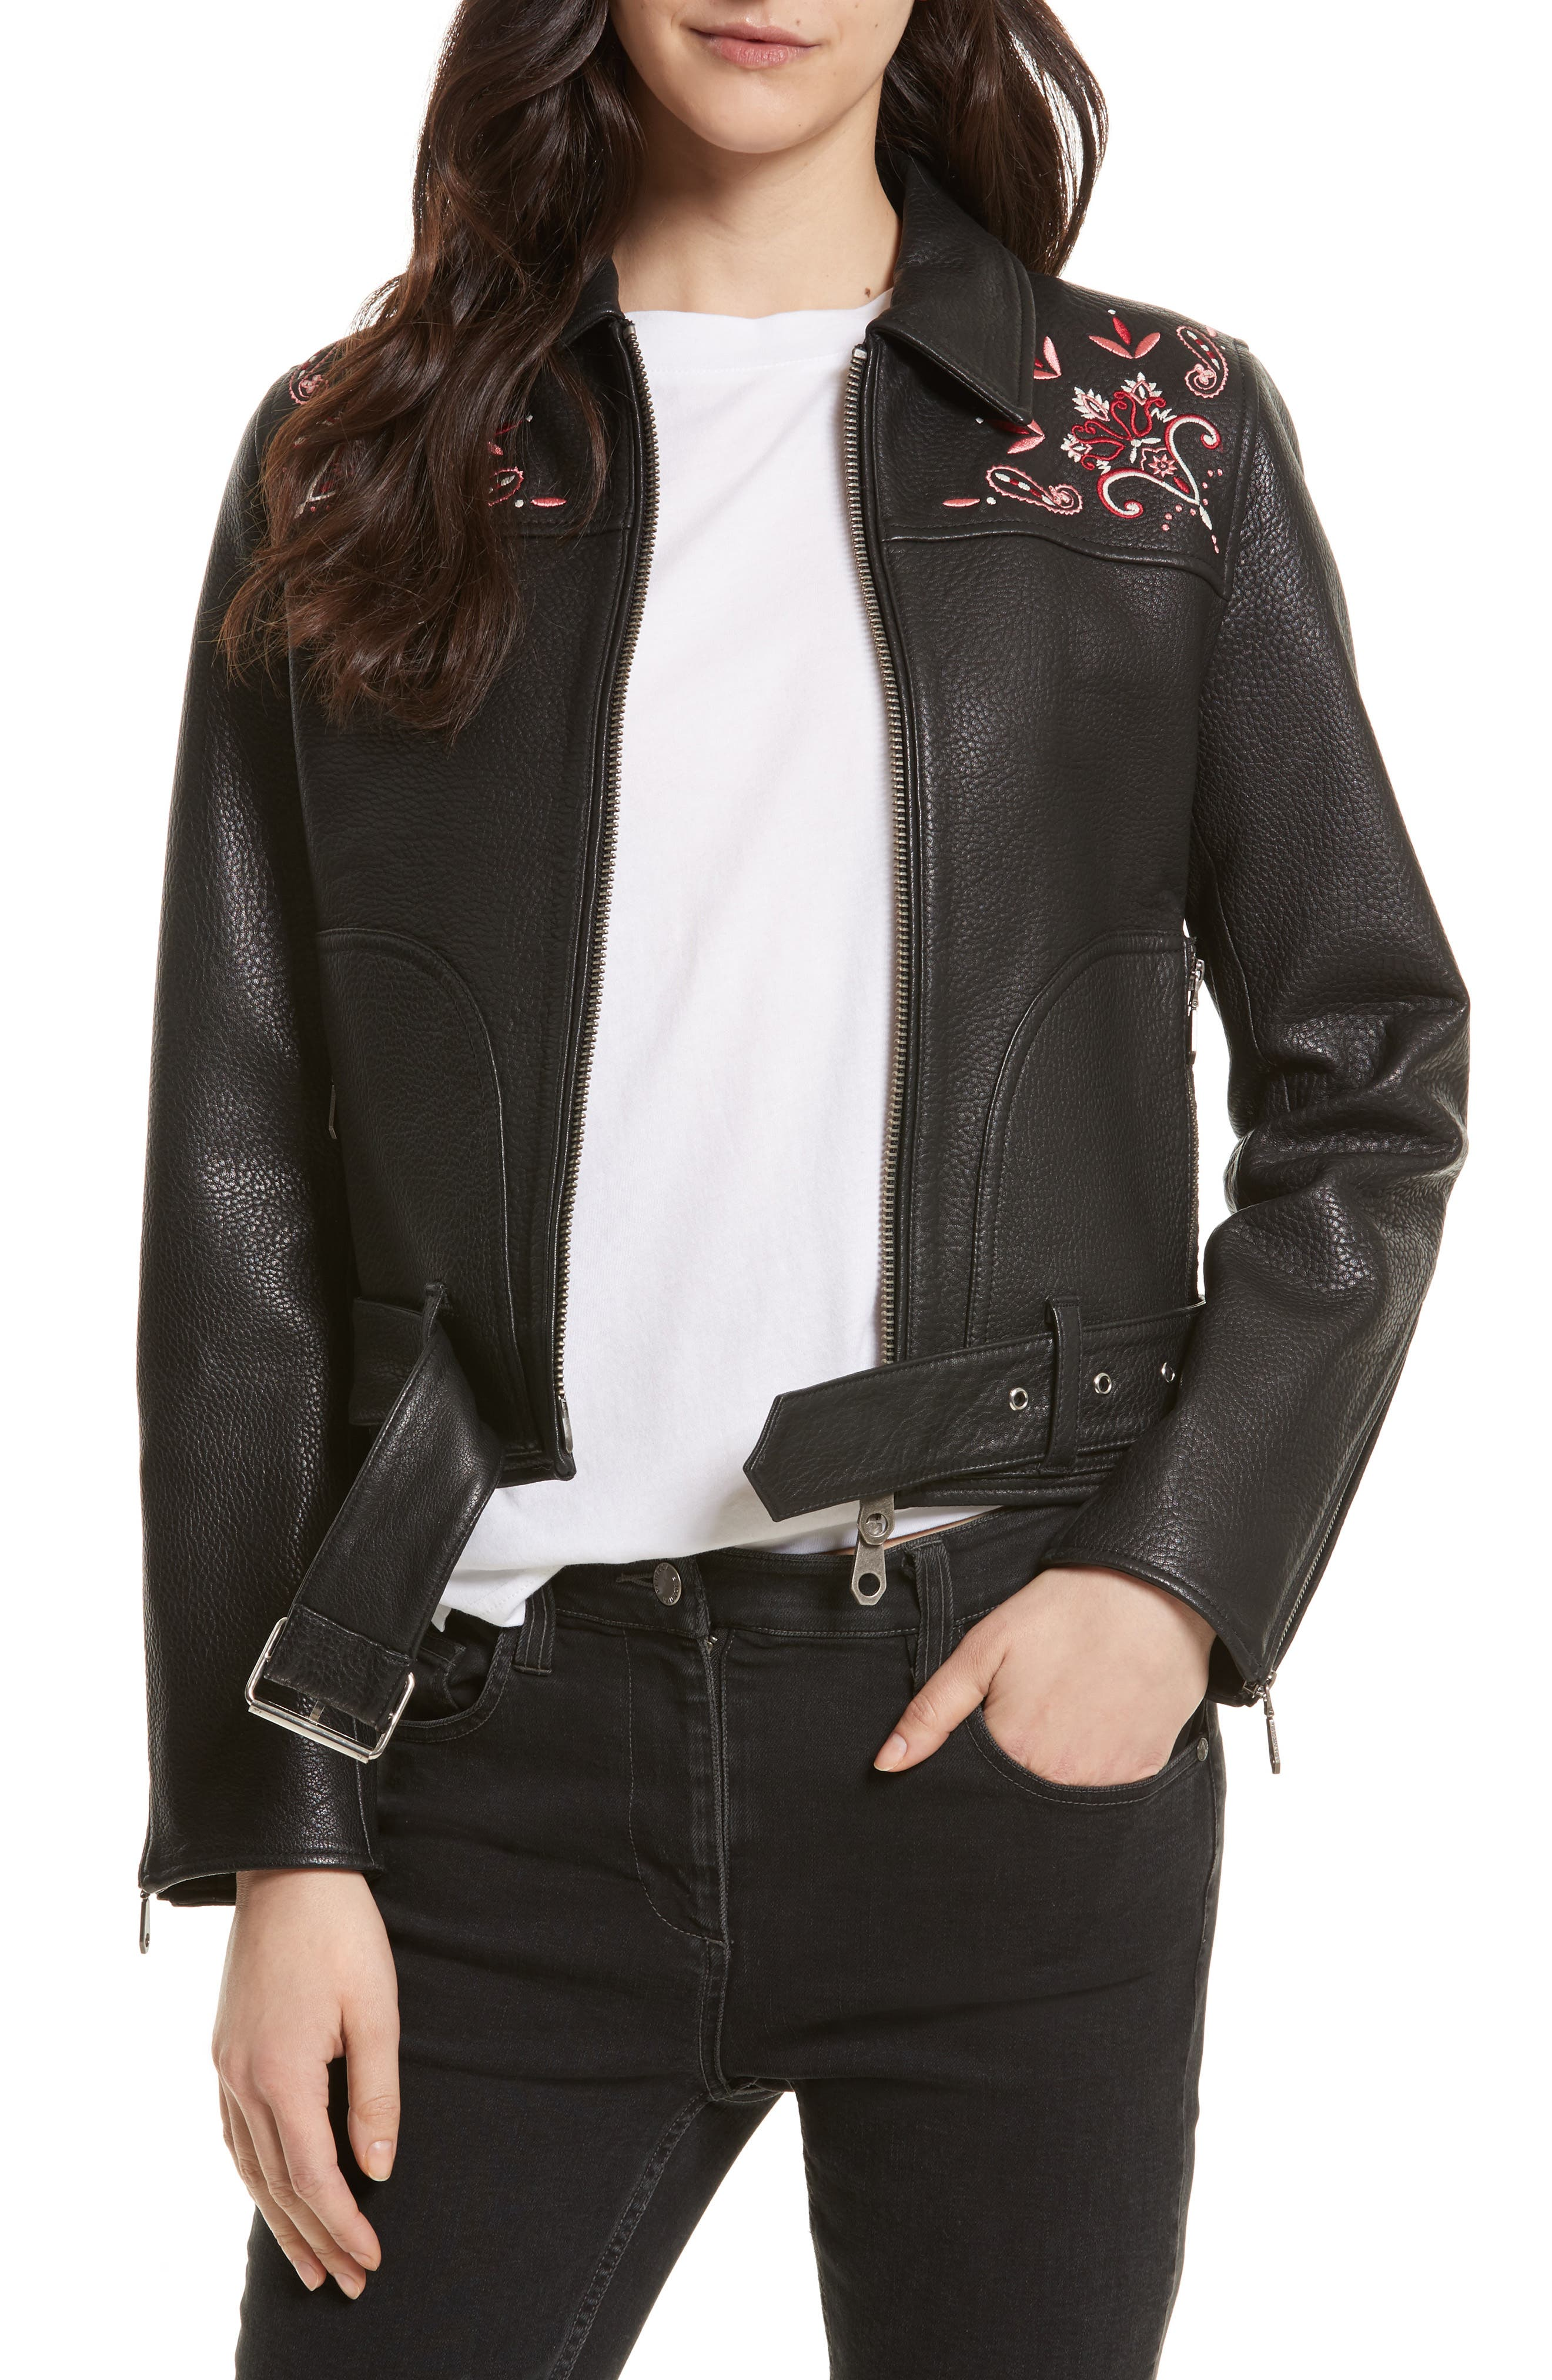 Rebecca Minkoff Washoe Embroidered Leather Jacket